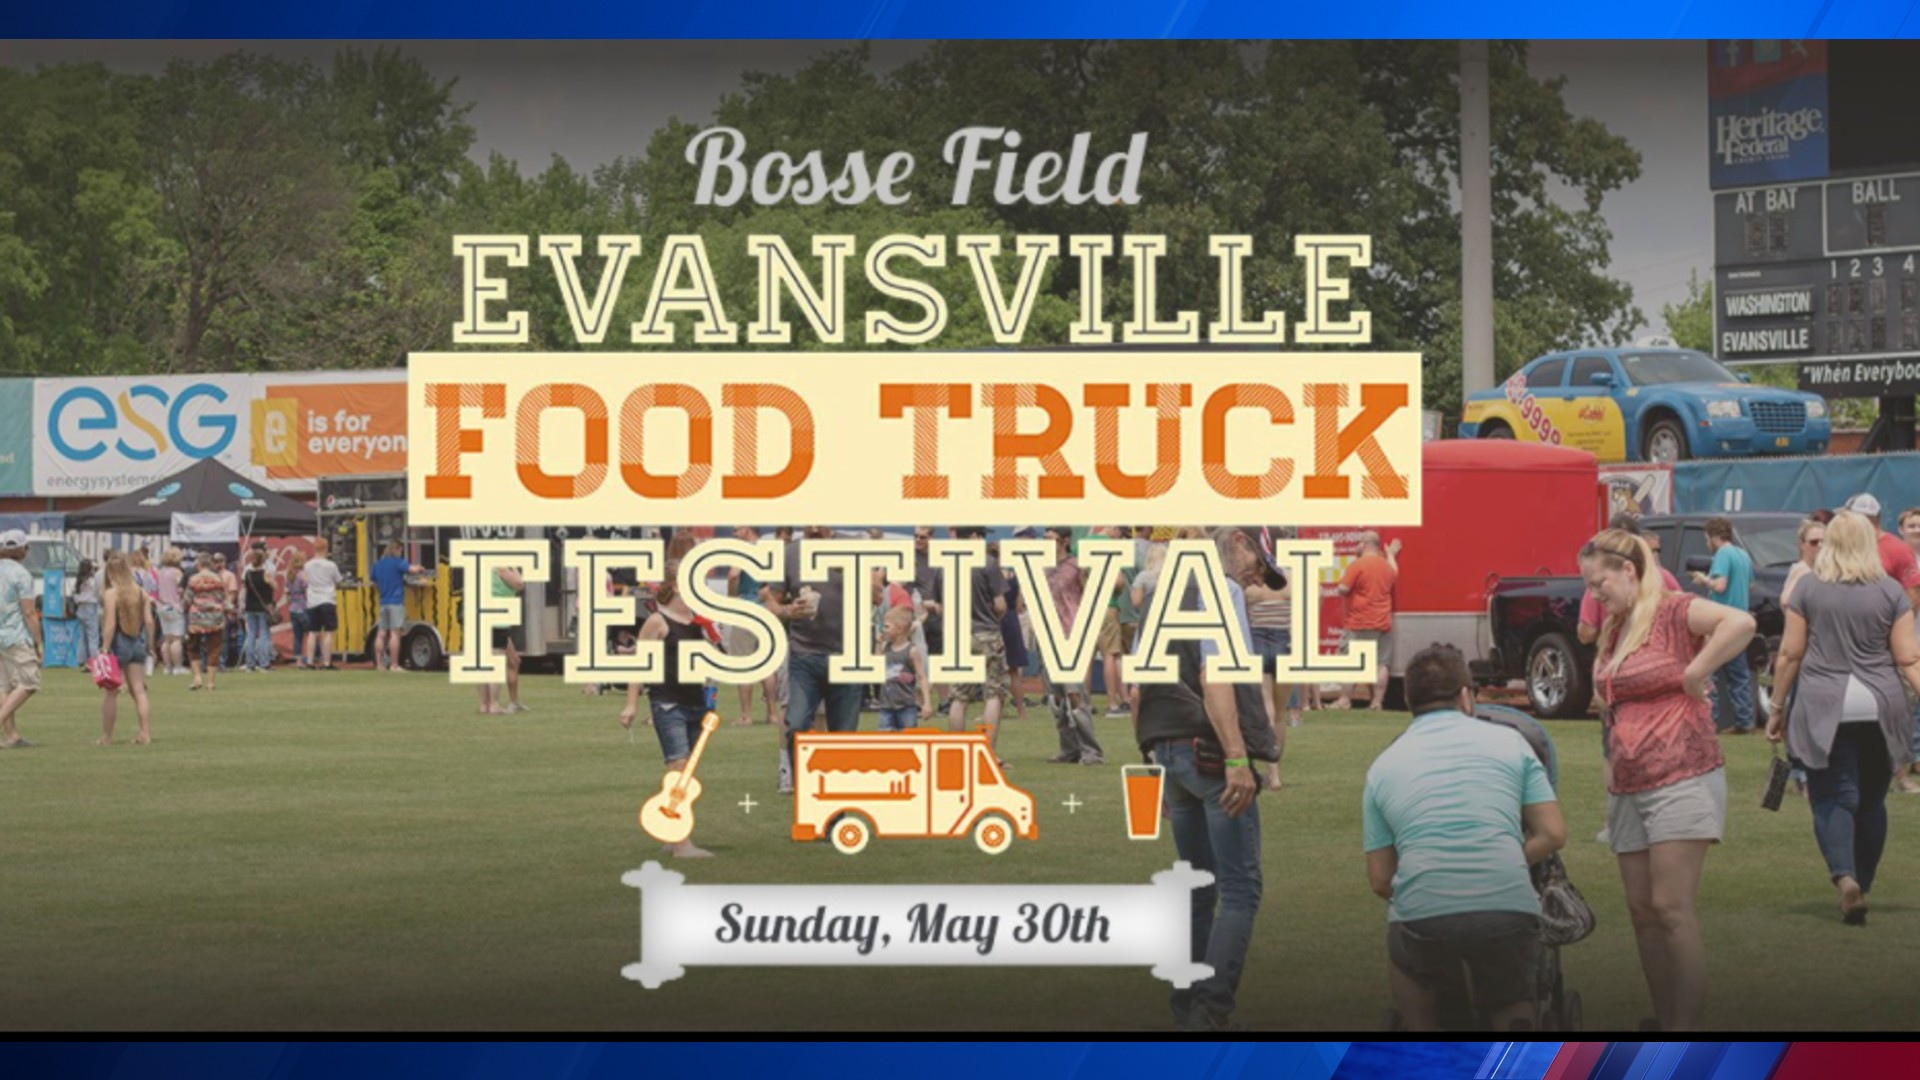 Evansville Food Truck Festival 2021